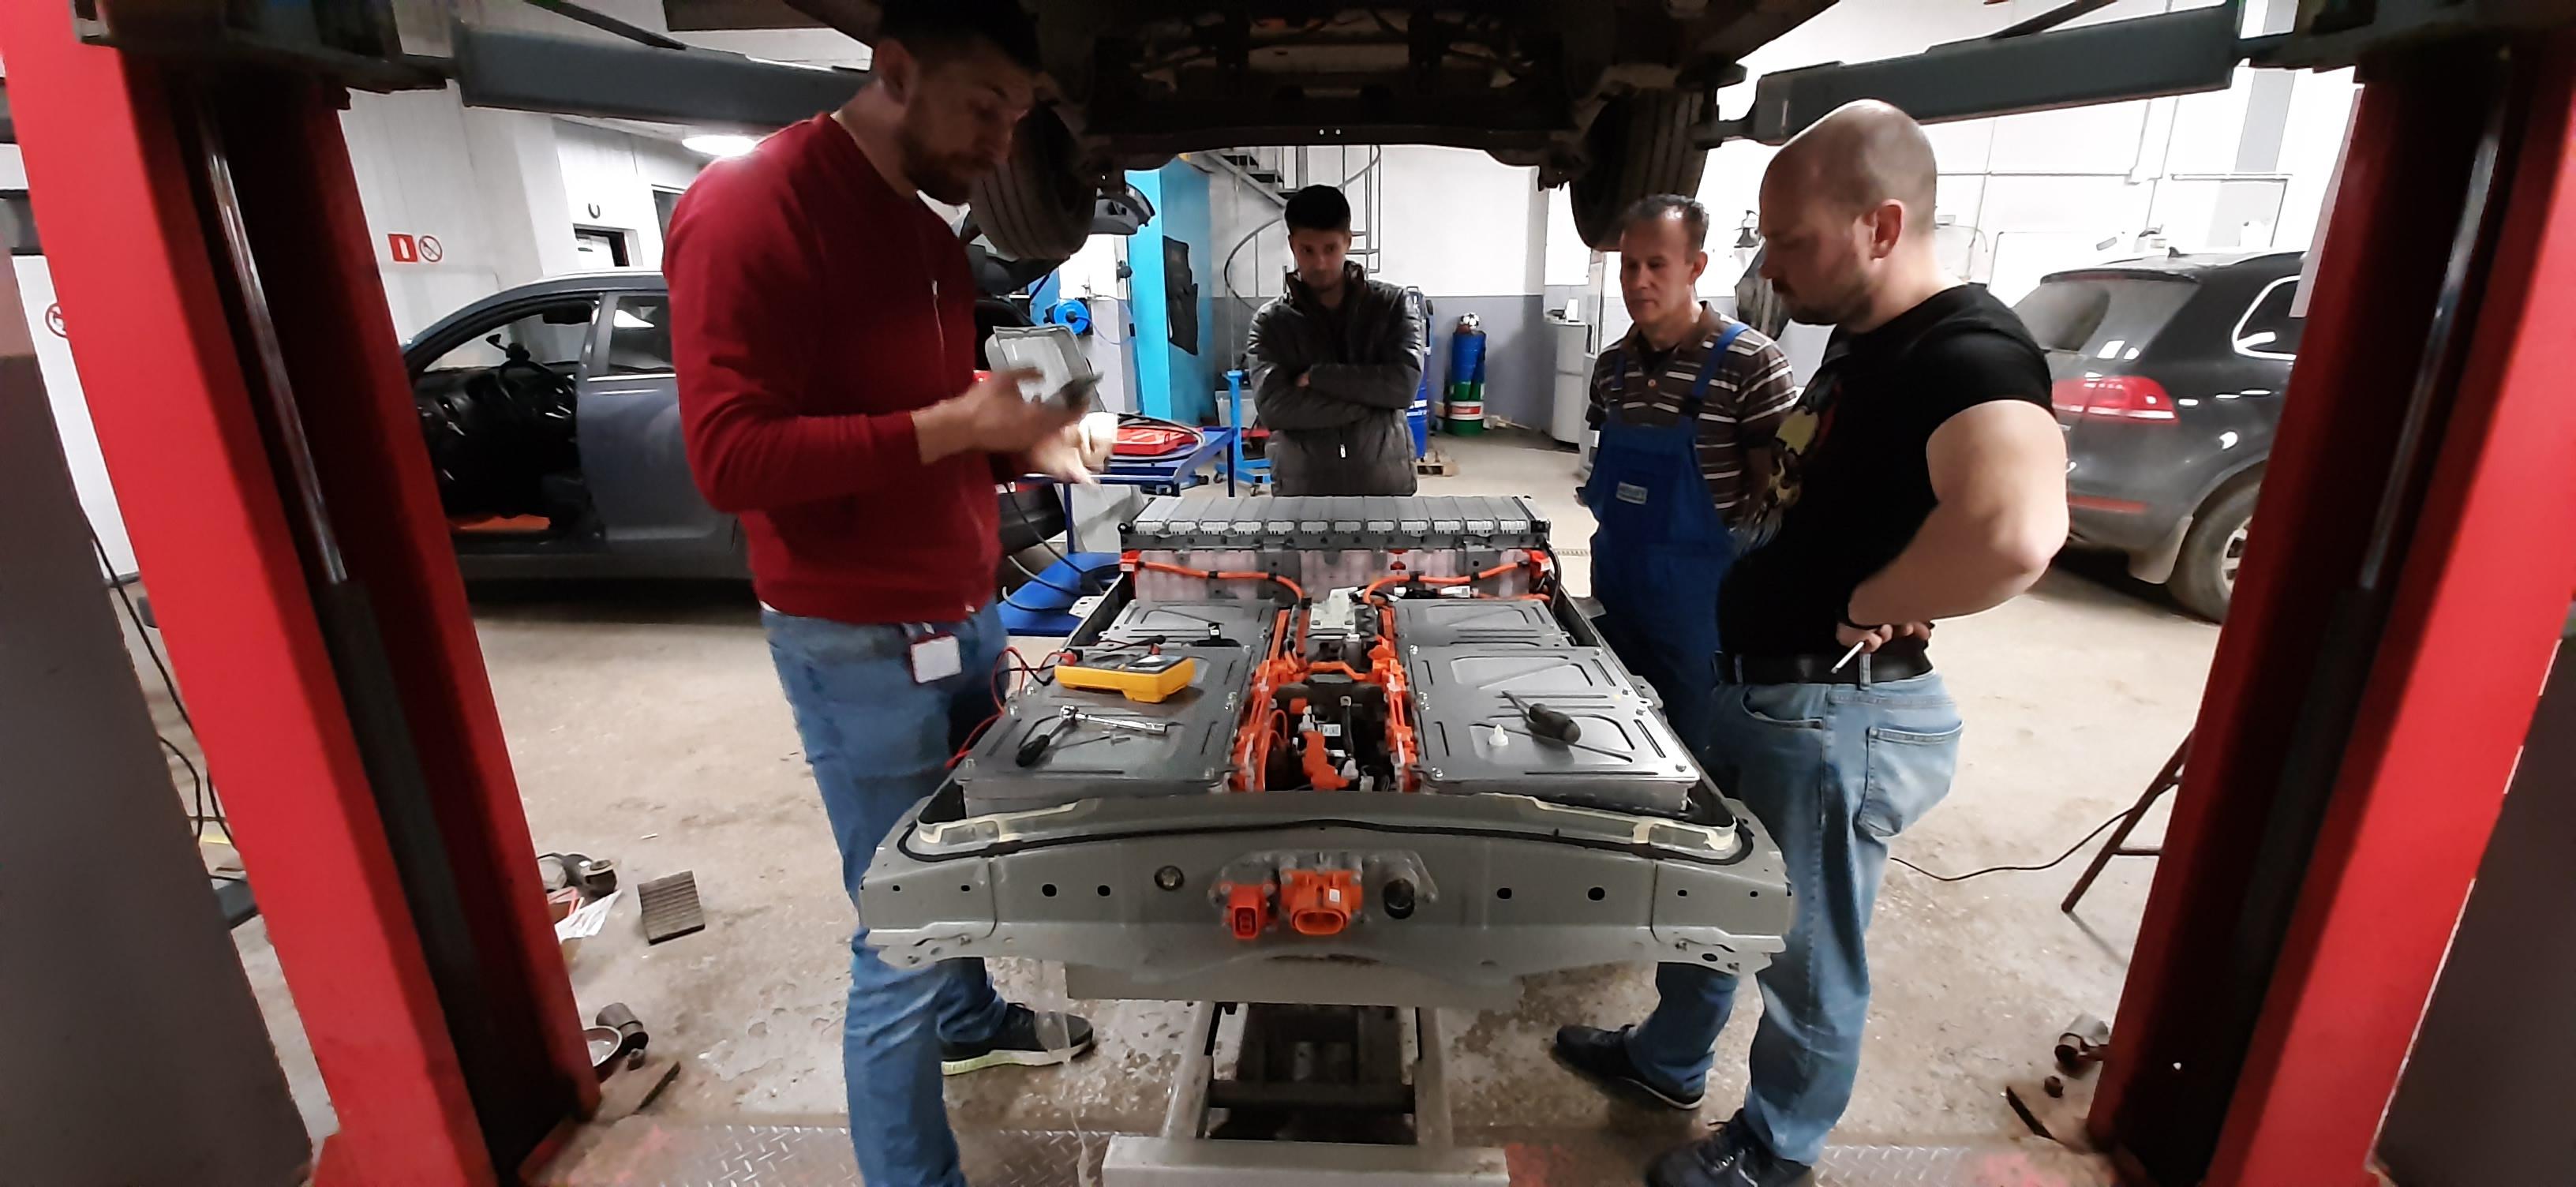 Установка доп.батареи 11.8Kw в багажник Nissan Leaf в Липецке!